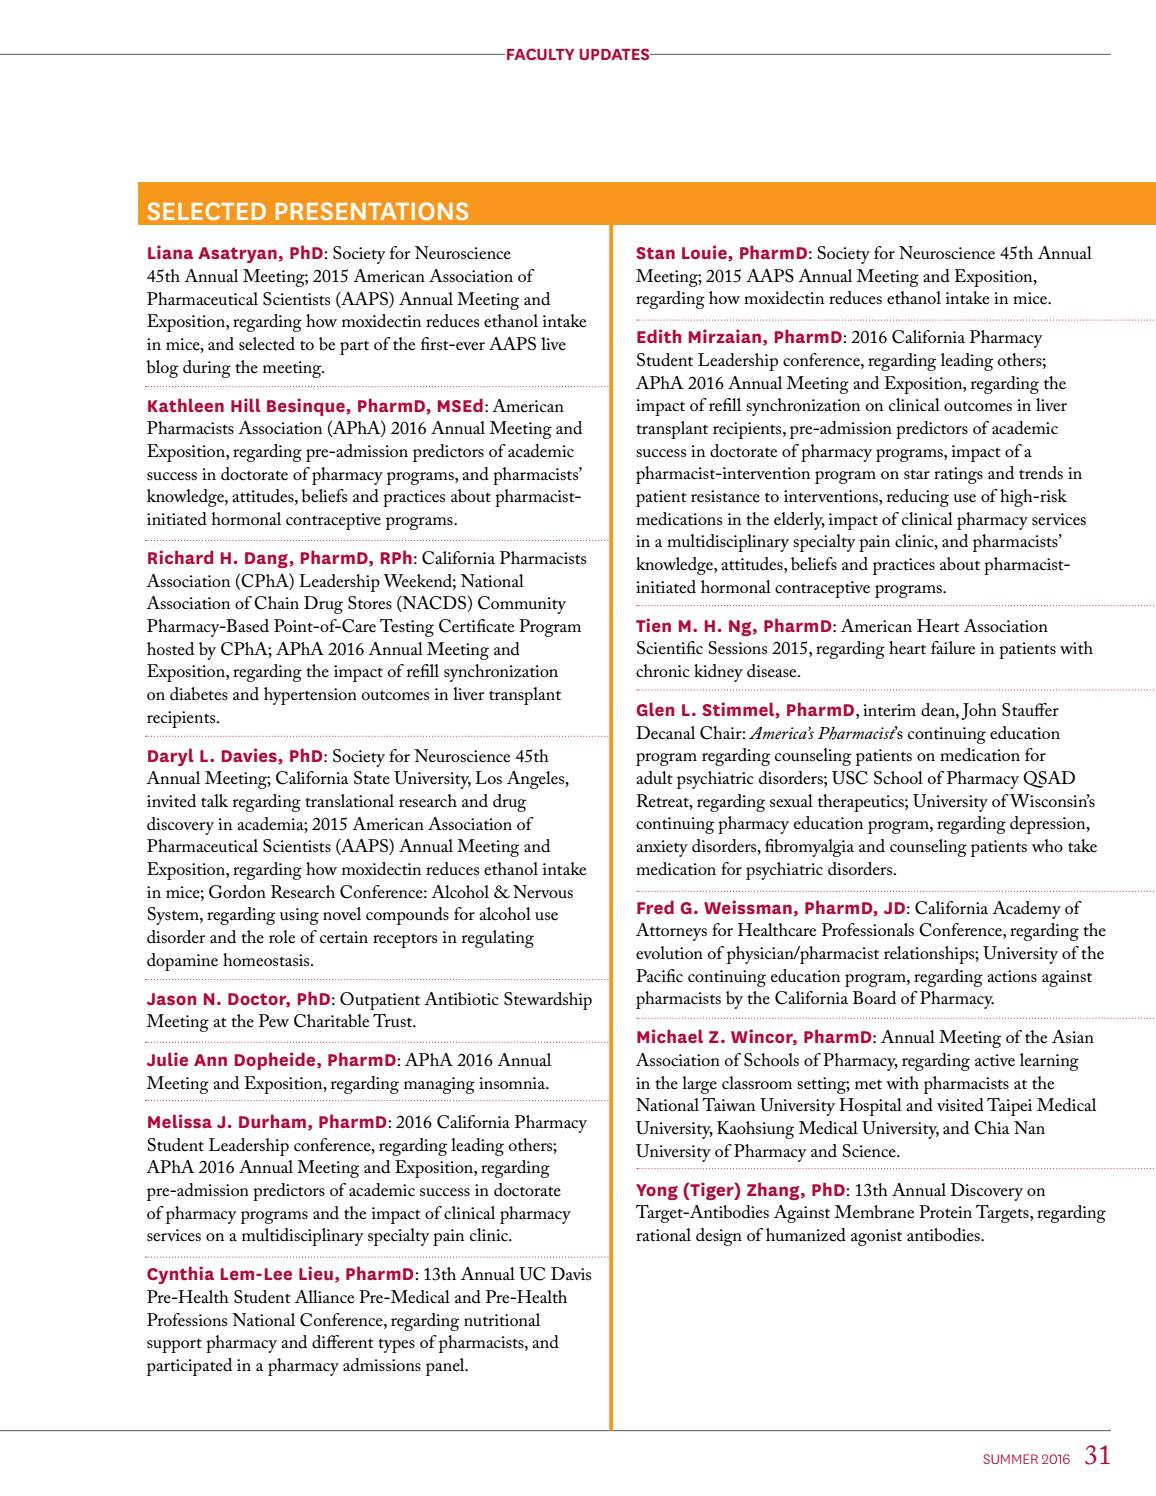 USC Pharmacy Magazine Summer 2016 by University of Southern